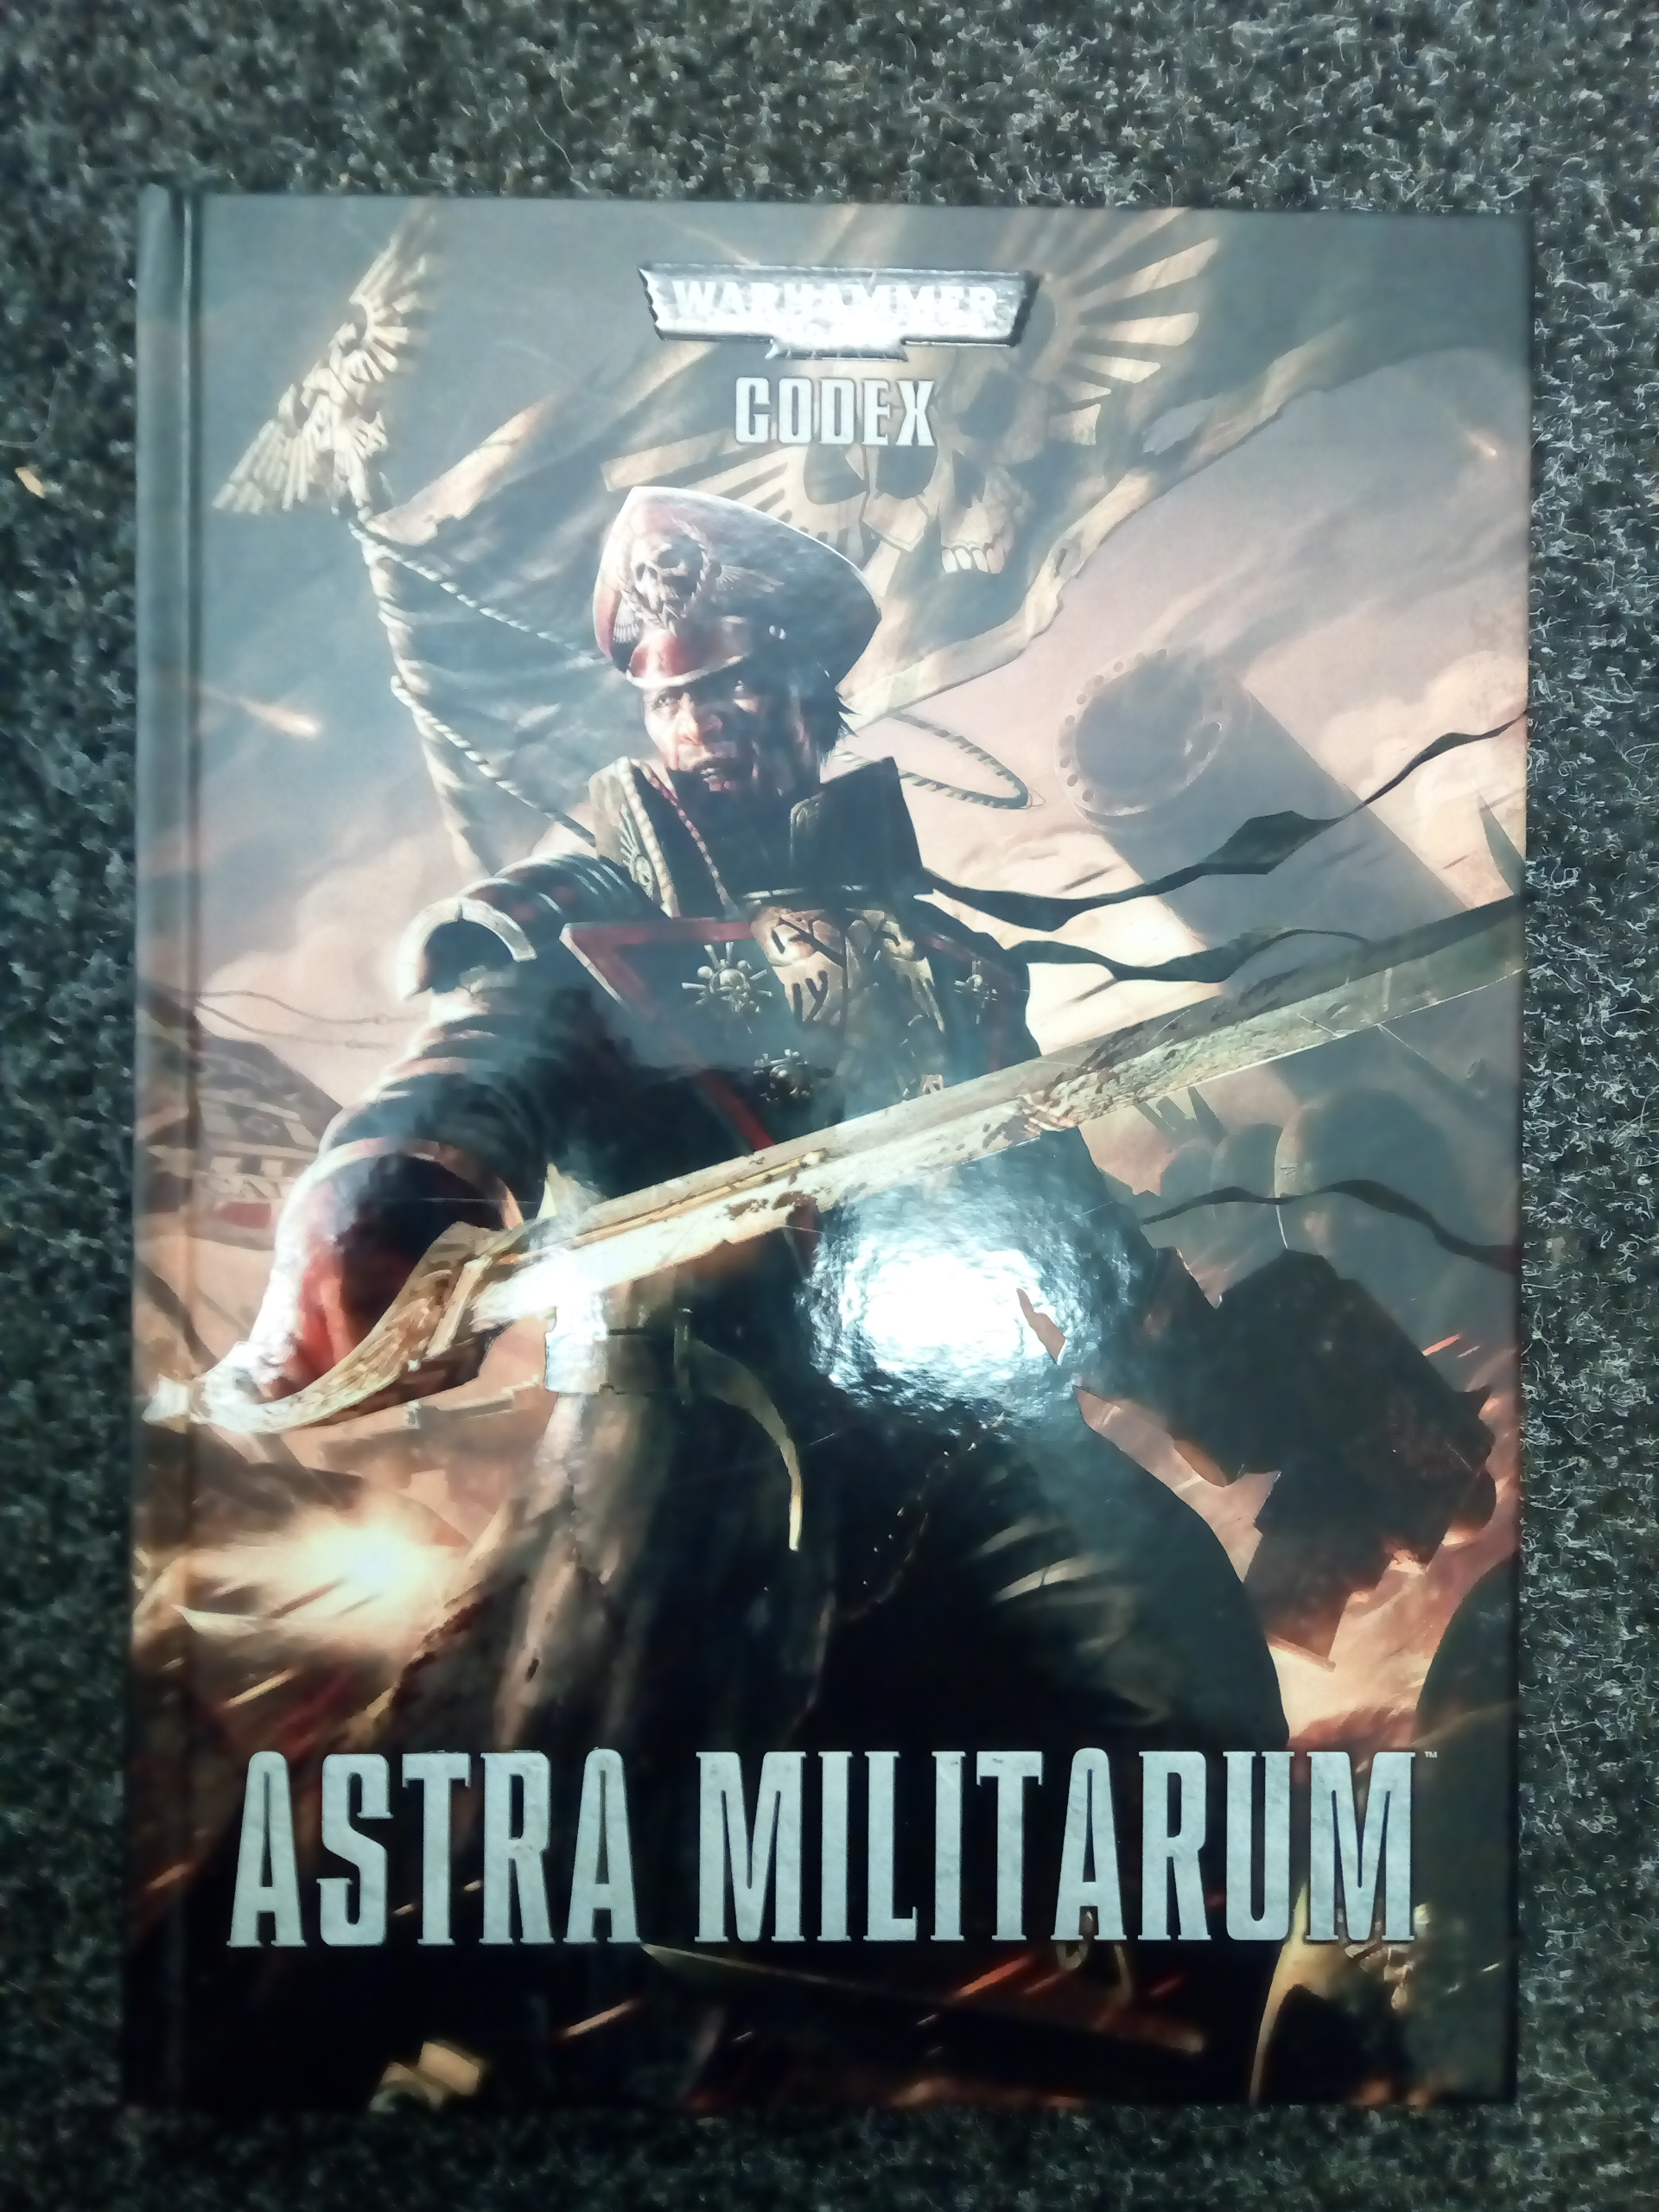 Warhammer 40,000 7th Edition Astra Militarum Codex